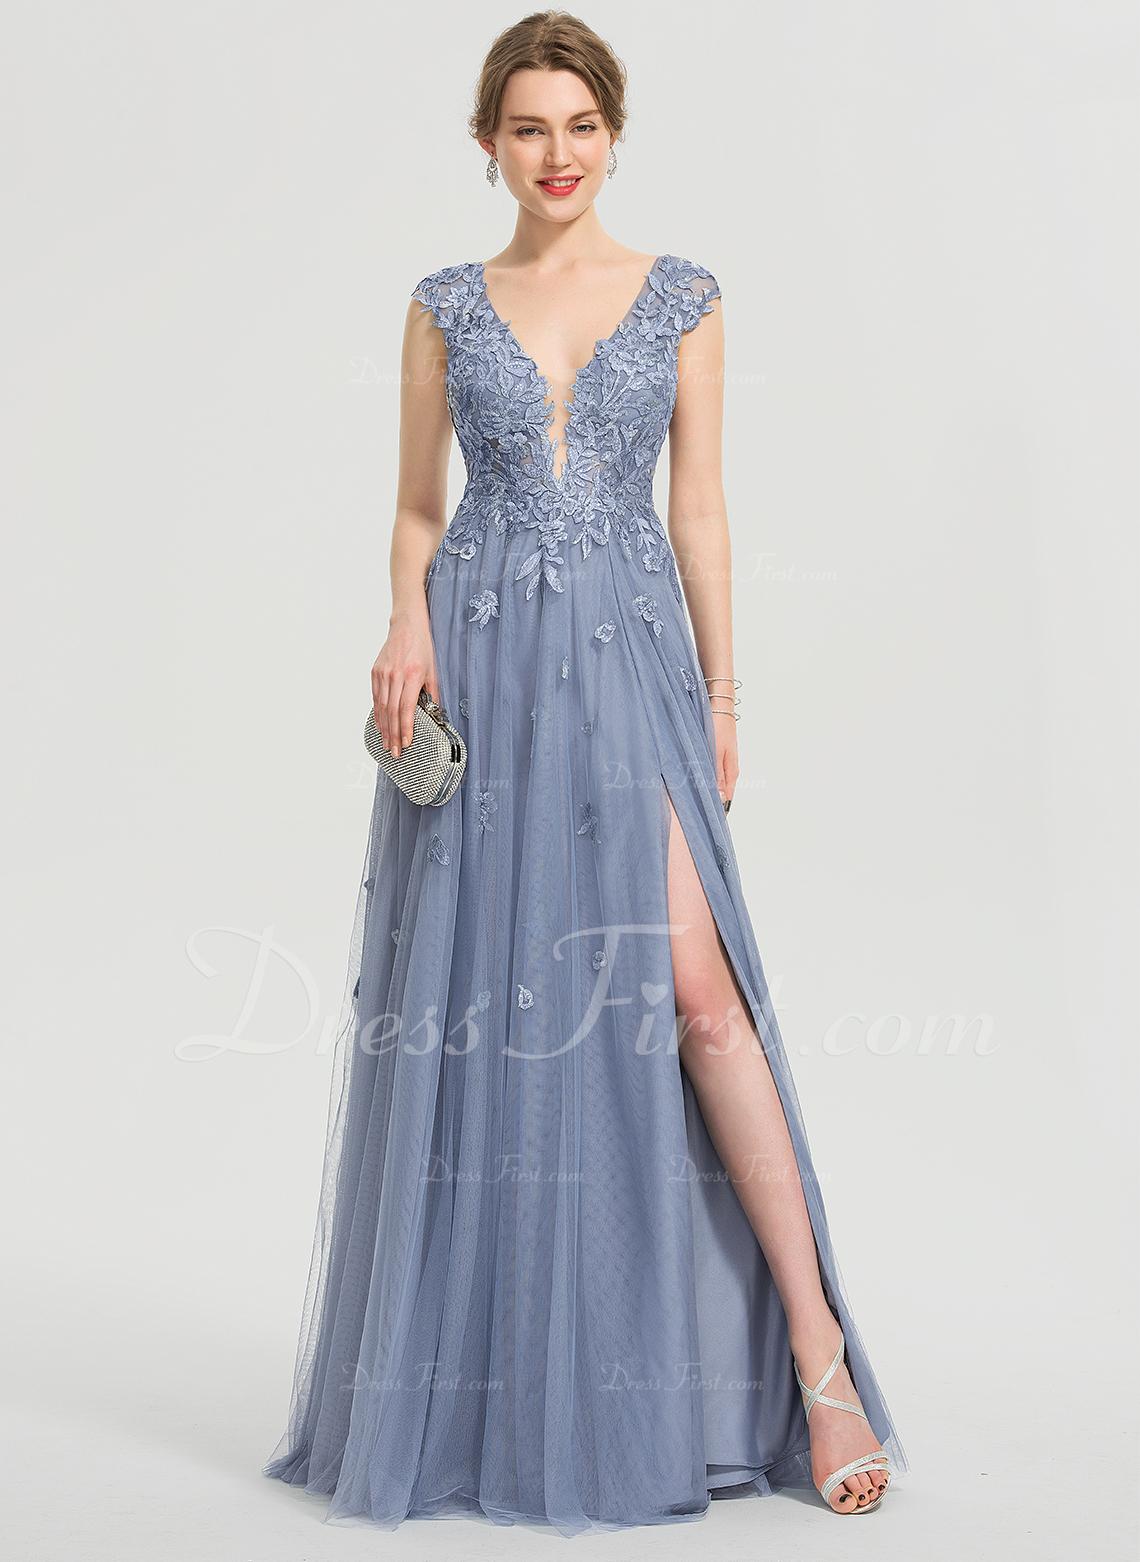 A-Line V-neck Floor-Length Tulle Evening Dress With Sequins Split Front